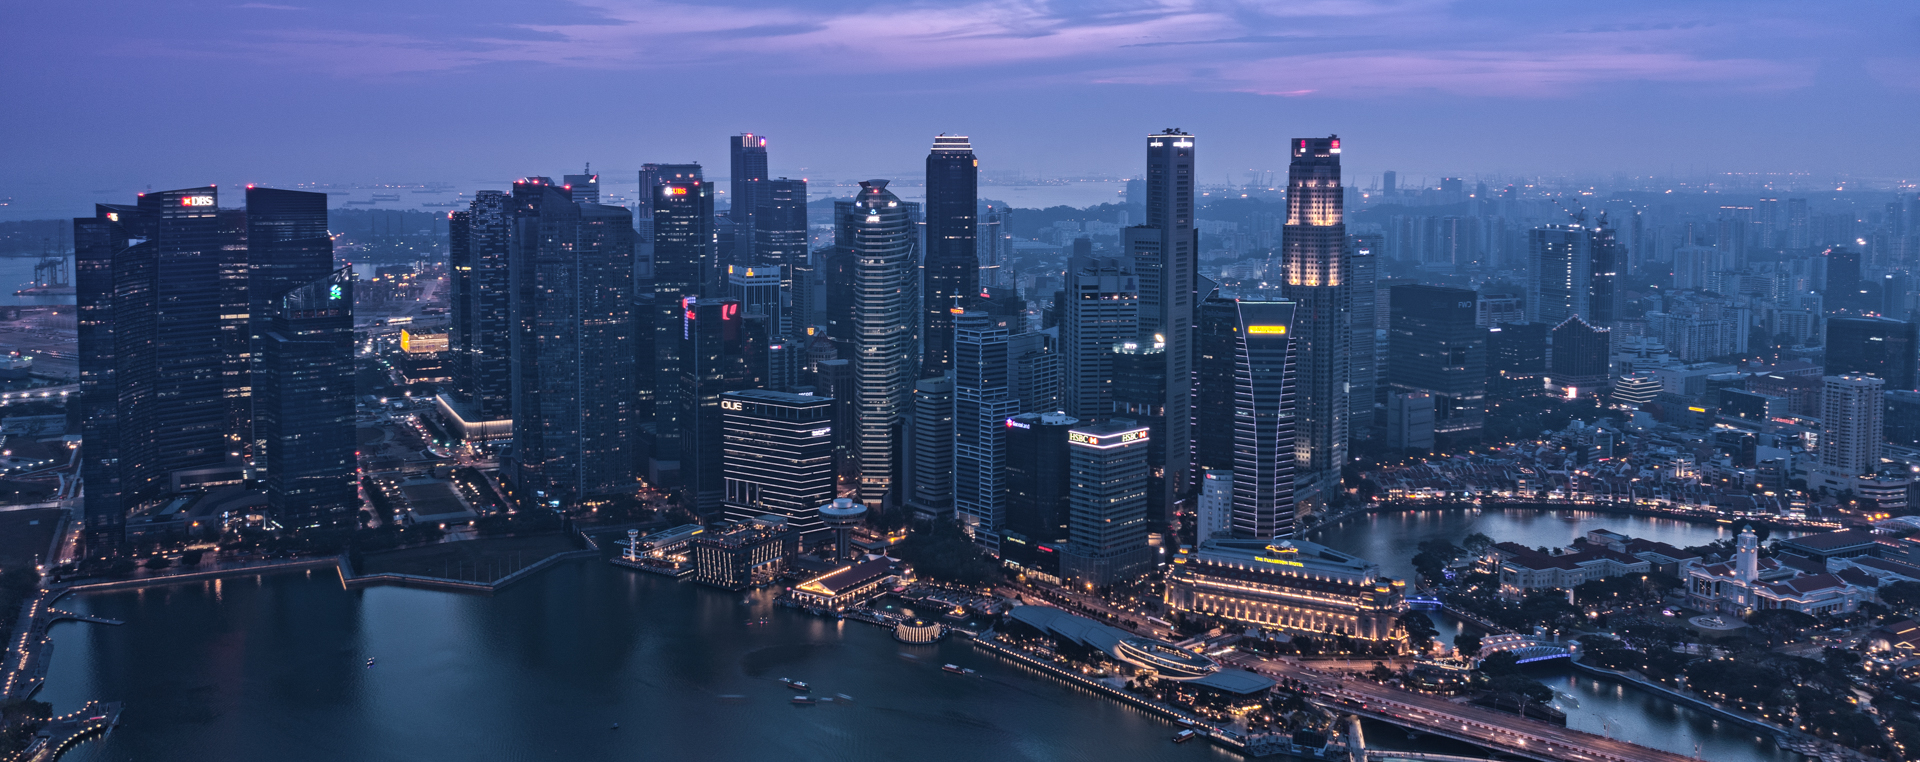 The Awakening in Singapore Downtown, Marina Bay, Clarke Quay, Boat Quay – Twilight